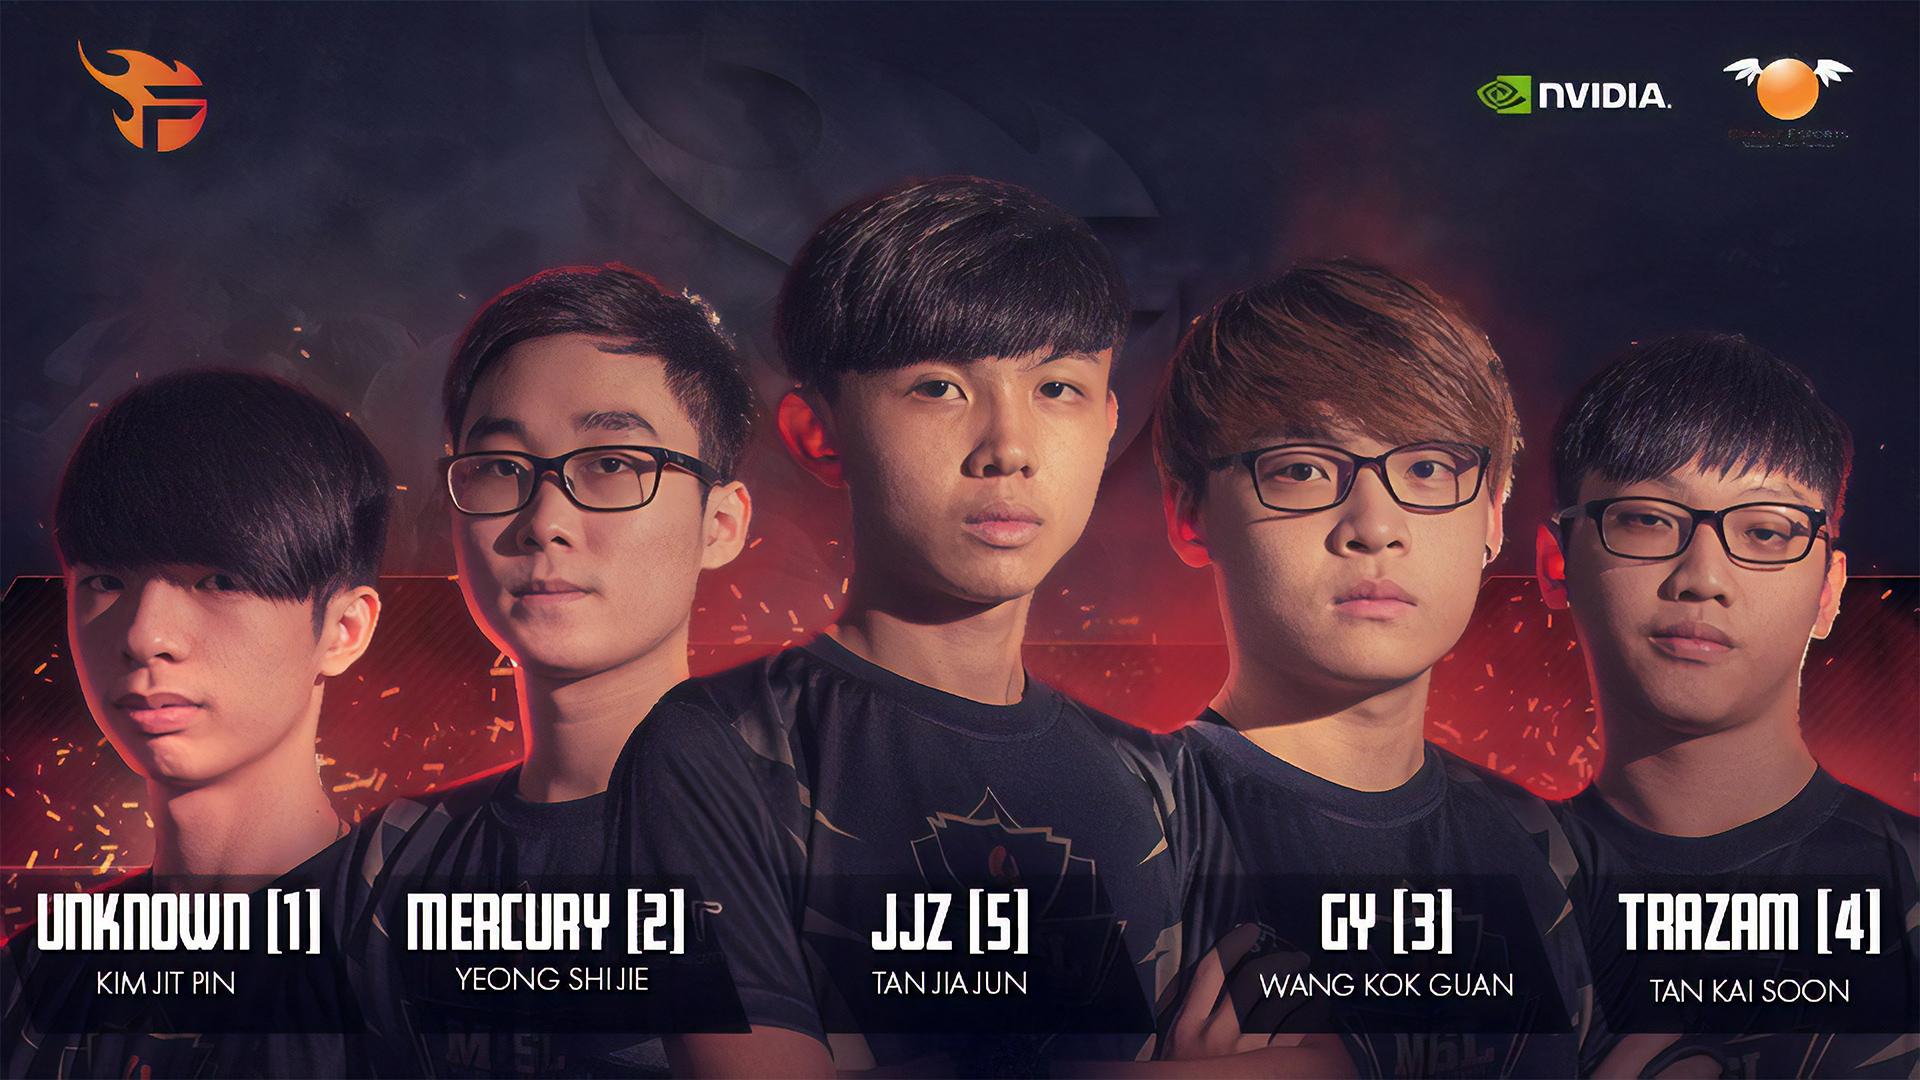 team flash dota 2 team announce 1